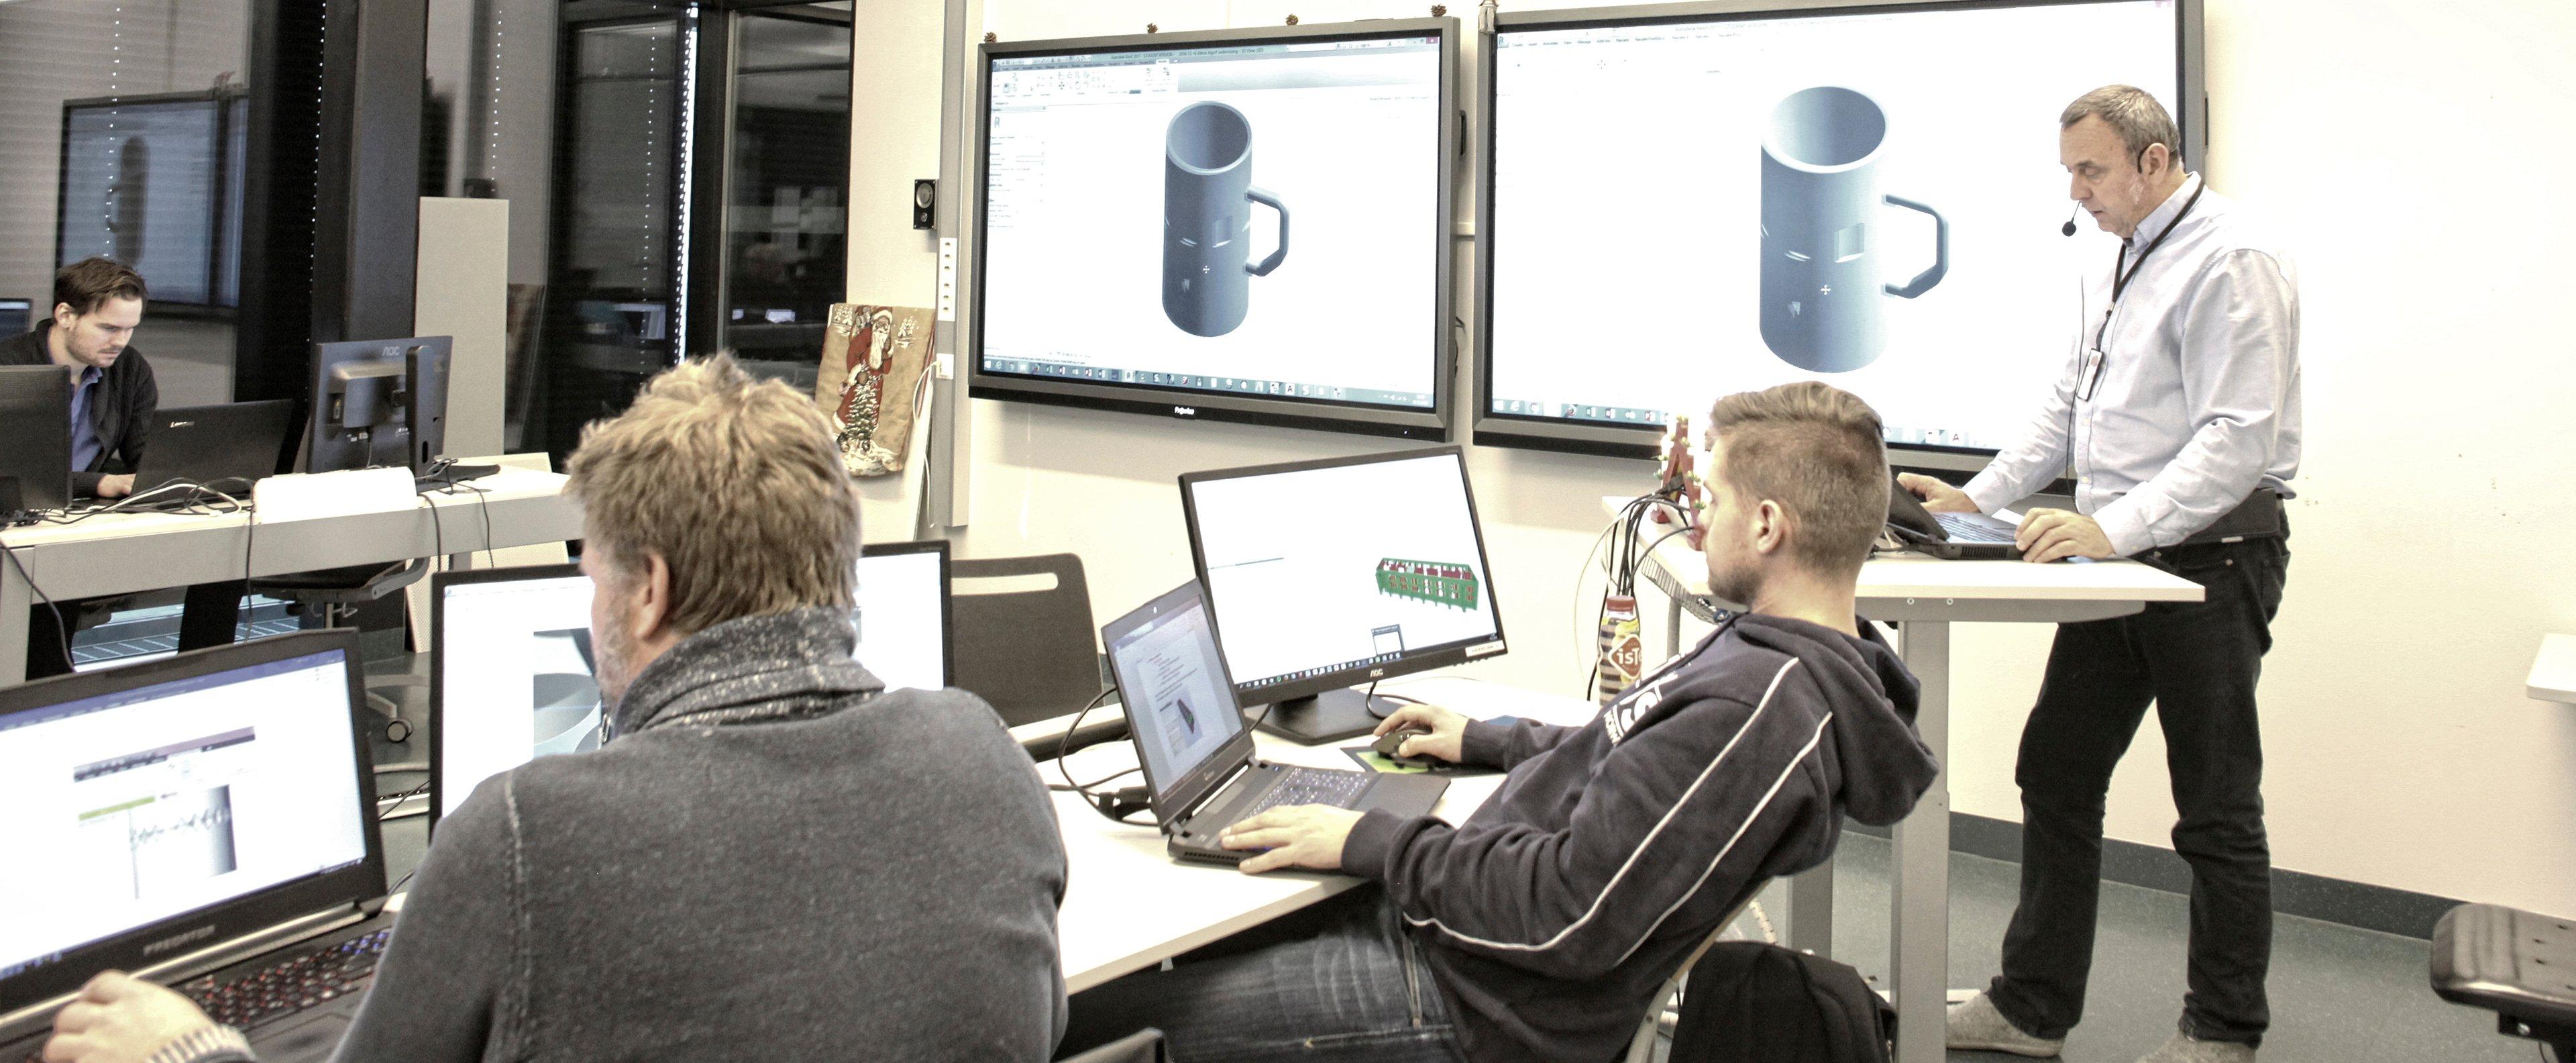 Header Interactive Norway Prowise BIM Fagskolen i Oslo og Akershus Kuben 2